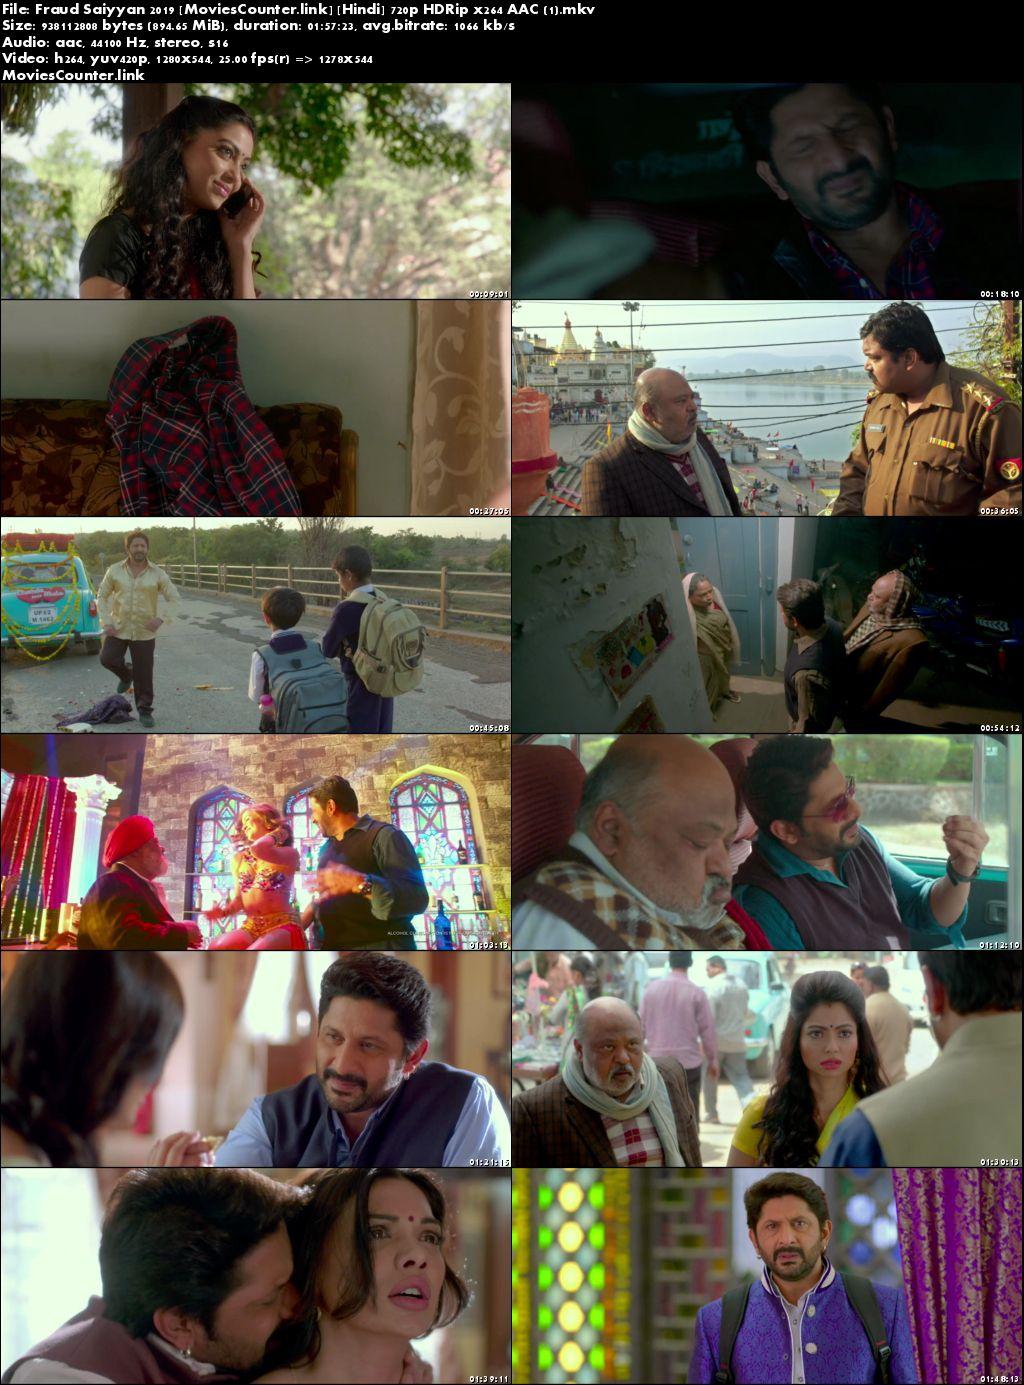 Screen Shots Fraud Saiyyan 2019 Hindi HD 720p